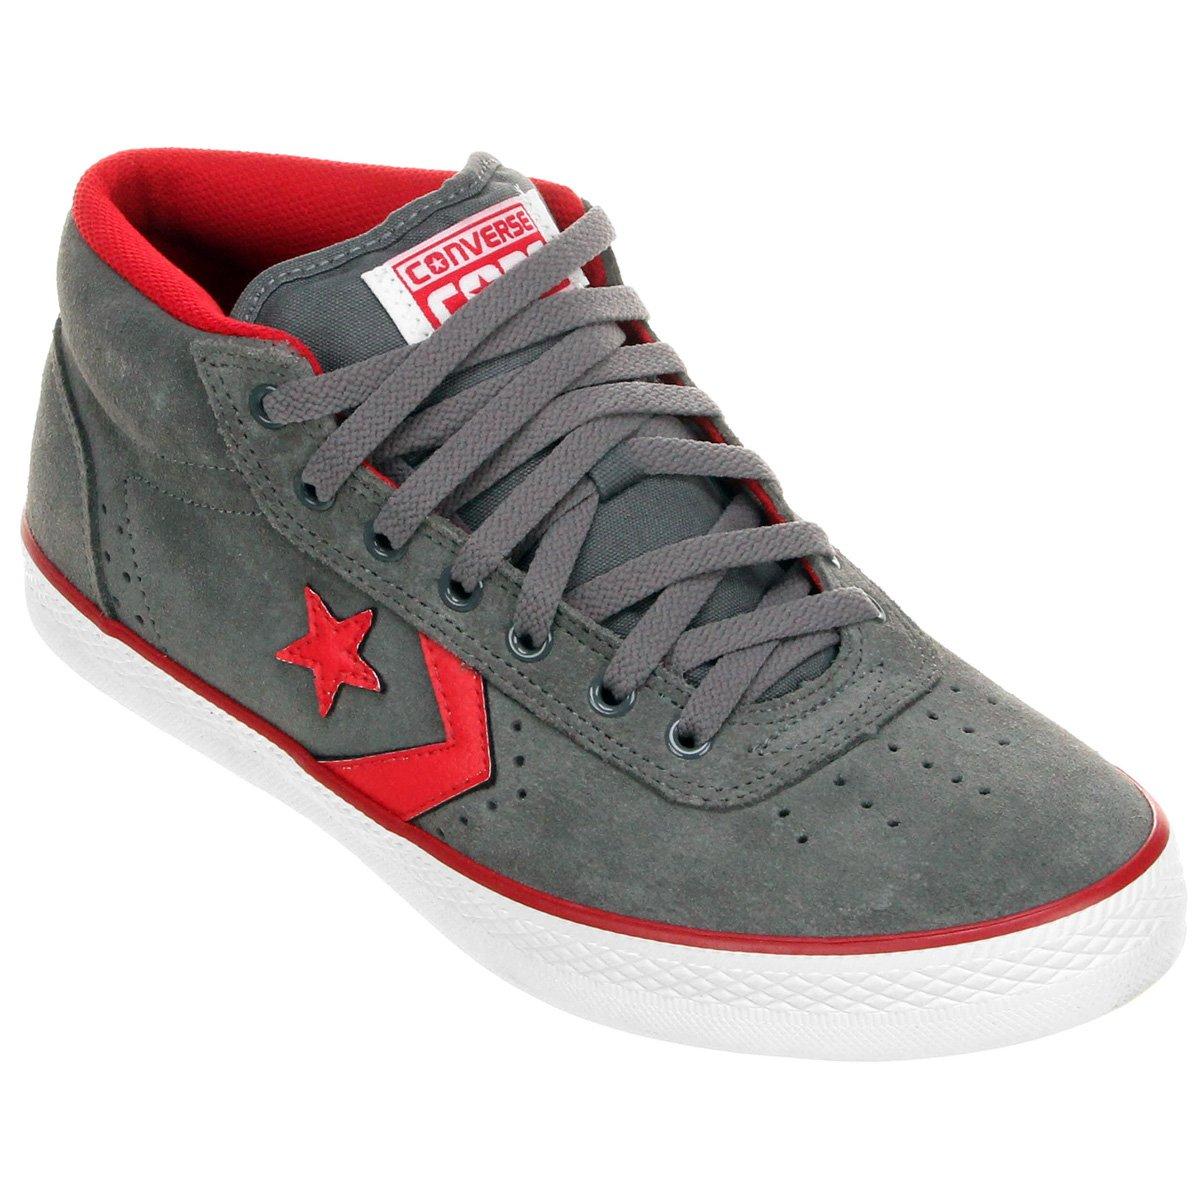 7c7aa92c4e7 ... Tênis Converse Skateboard Wells Mid - Cinza+Vermelho. FEMININO